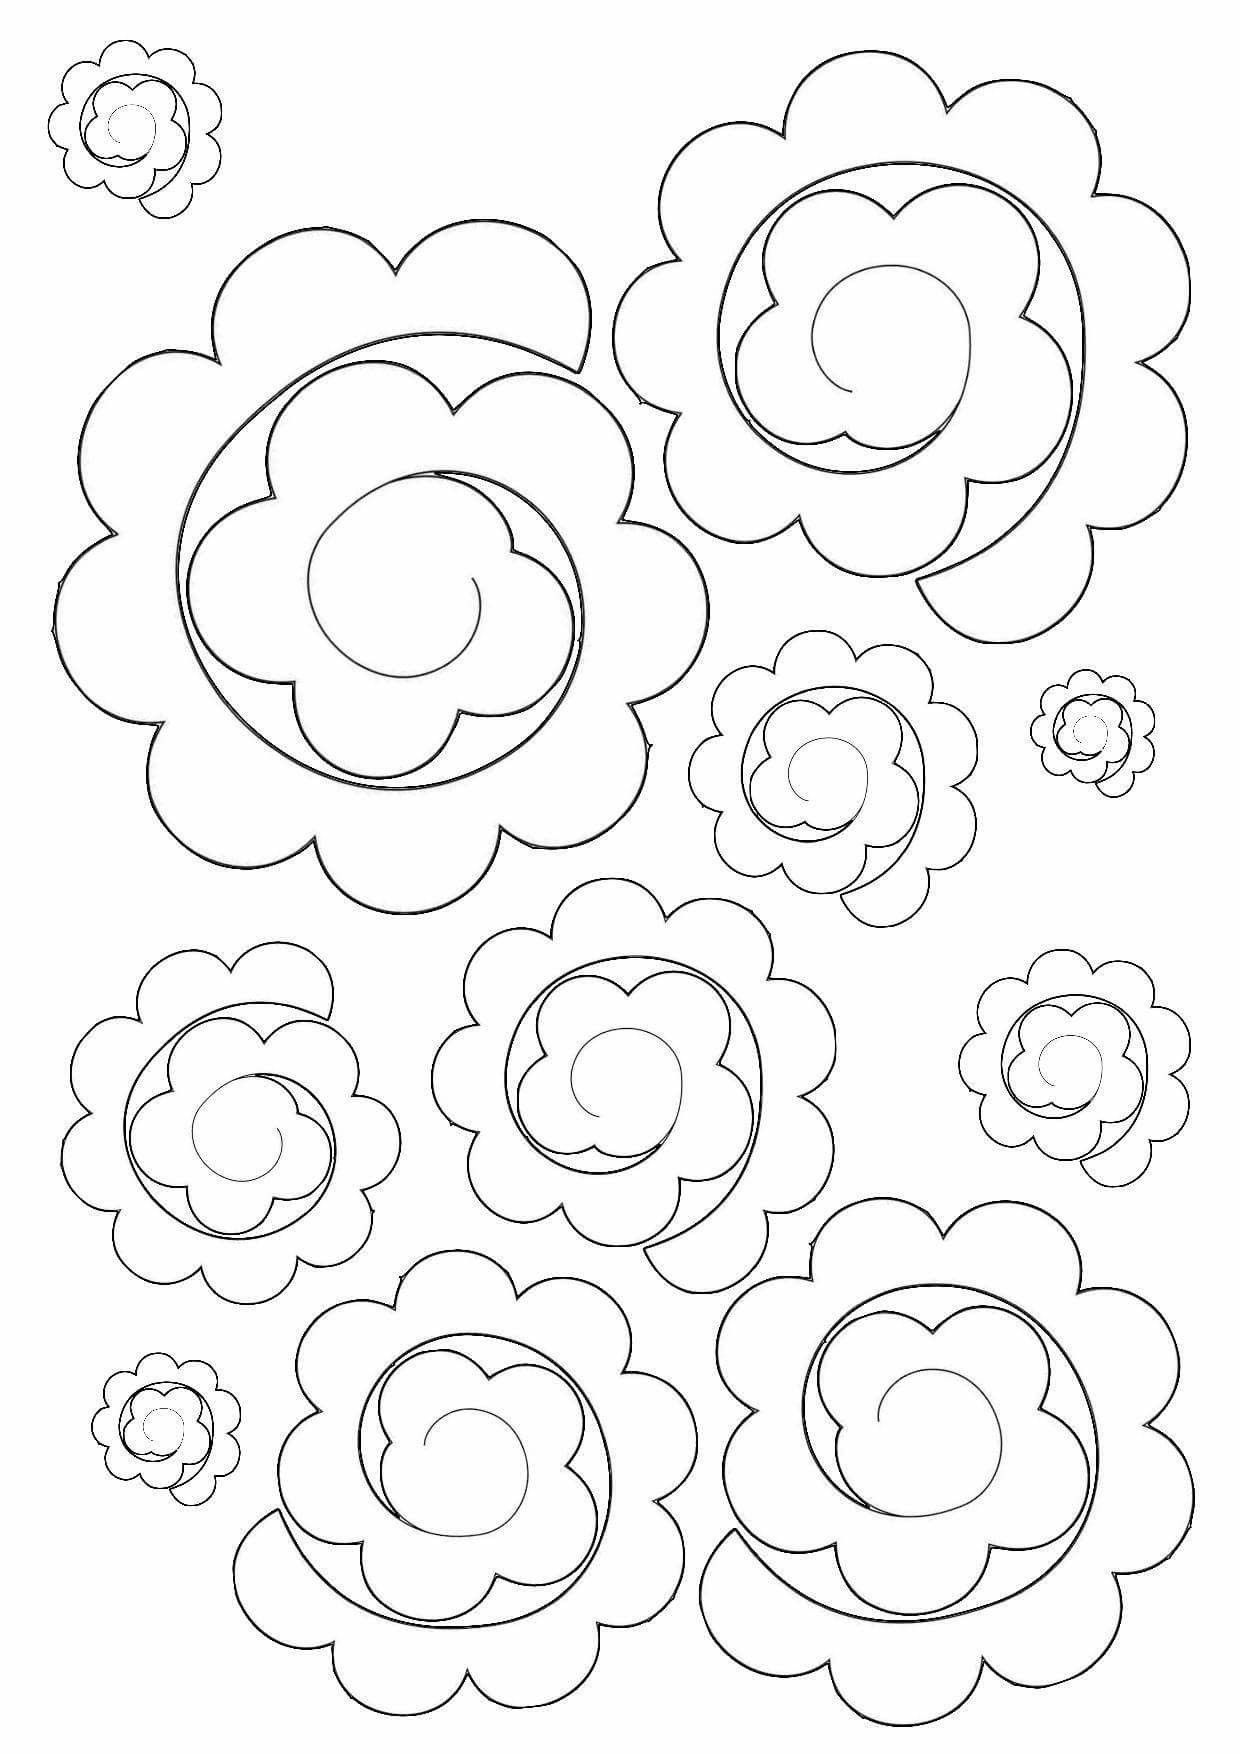 #feltflowertemplate #feltflowertemplate #